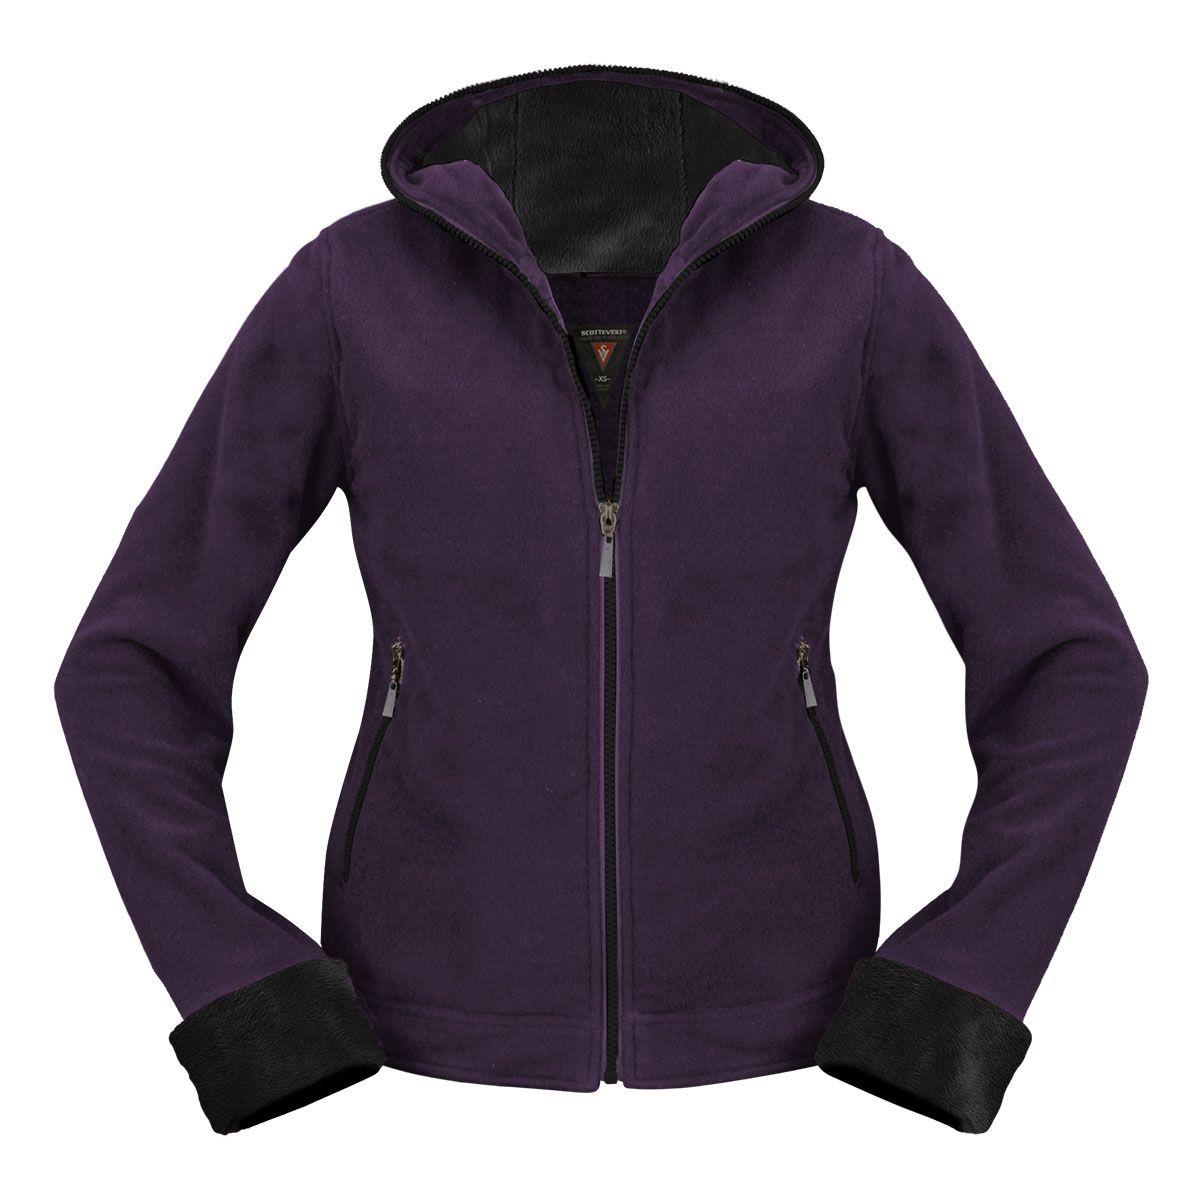 Womenus fleece chloe hoodie mens fleece jackets pinterest